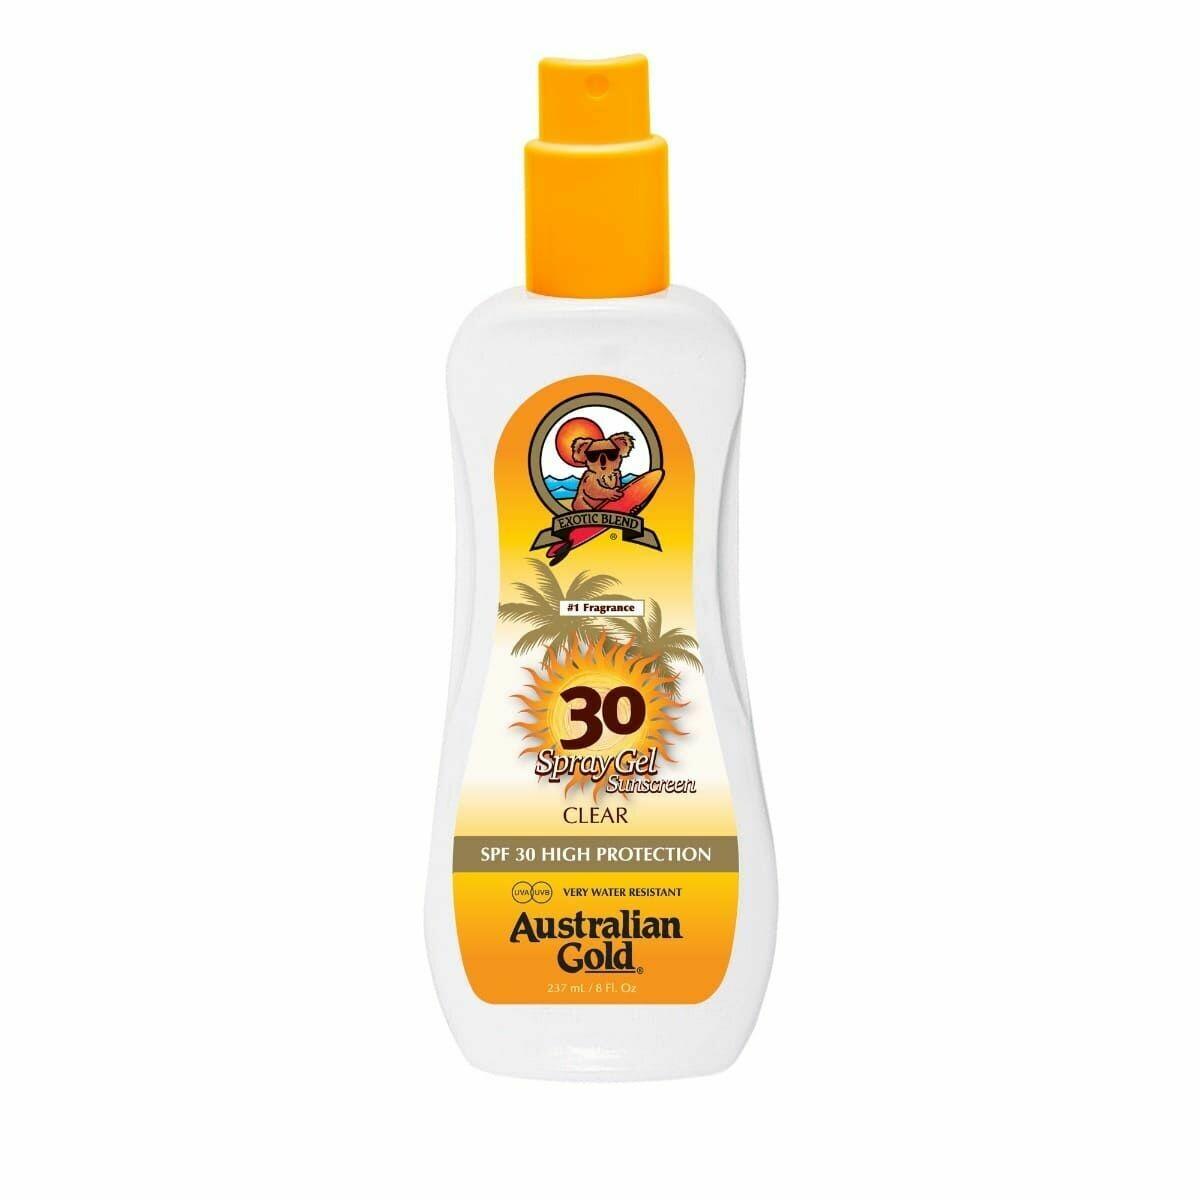 Australian Gold Spf 30 Spray Gel 237ml - Cocoa Dreams